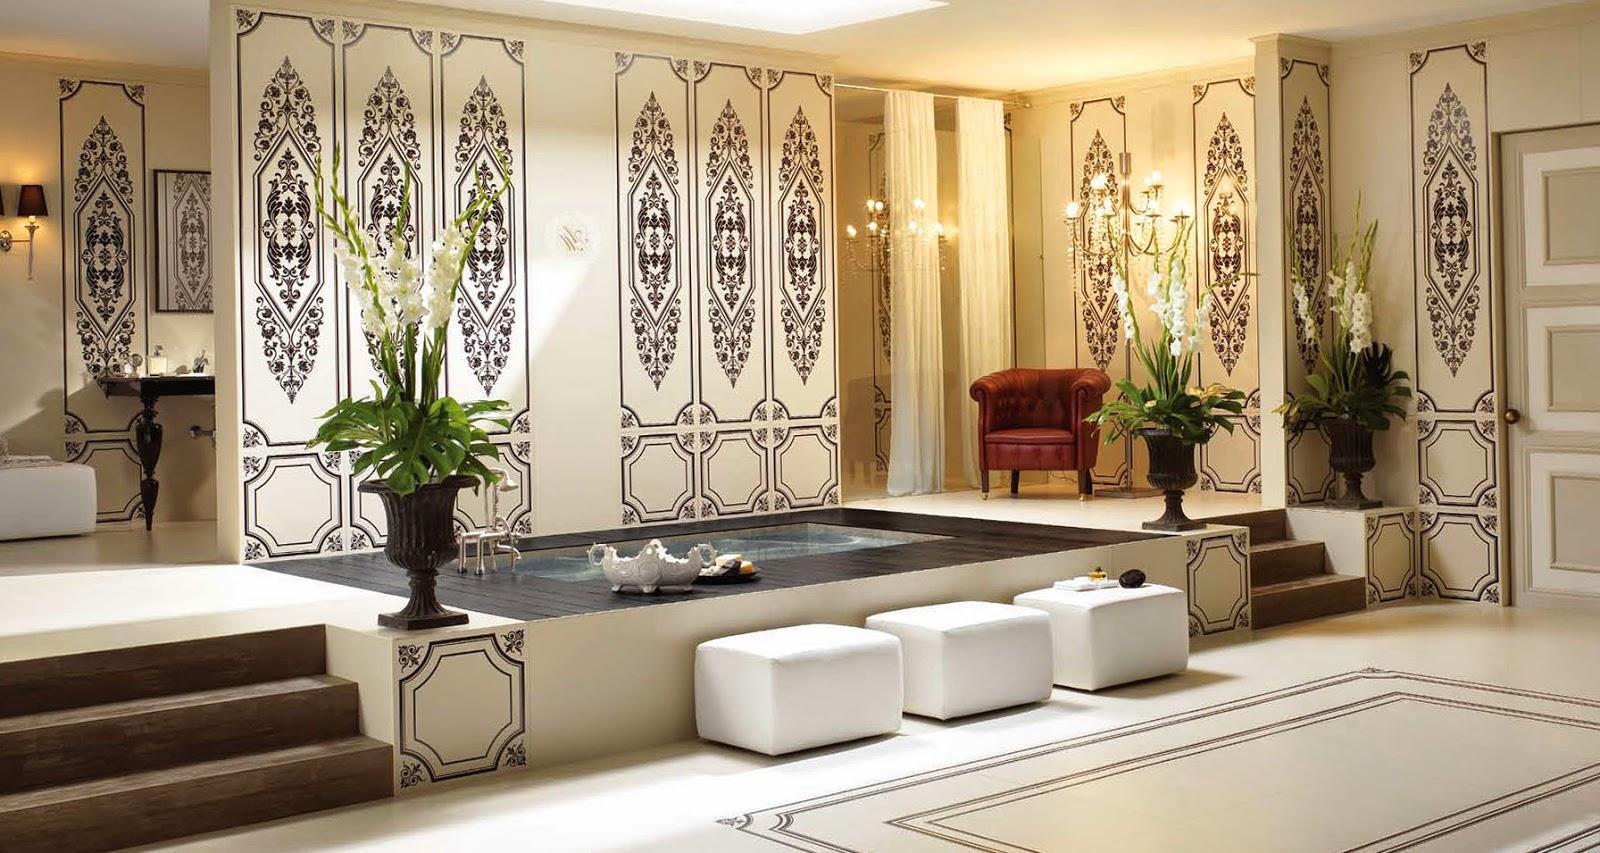 annaline interior design p ytki ceramiczne moda i trendy w 2014. Black Bedroom Furniture Sets. Home Design Ideas